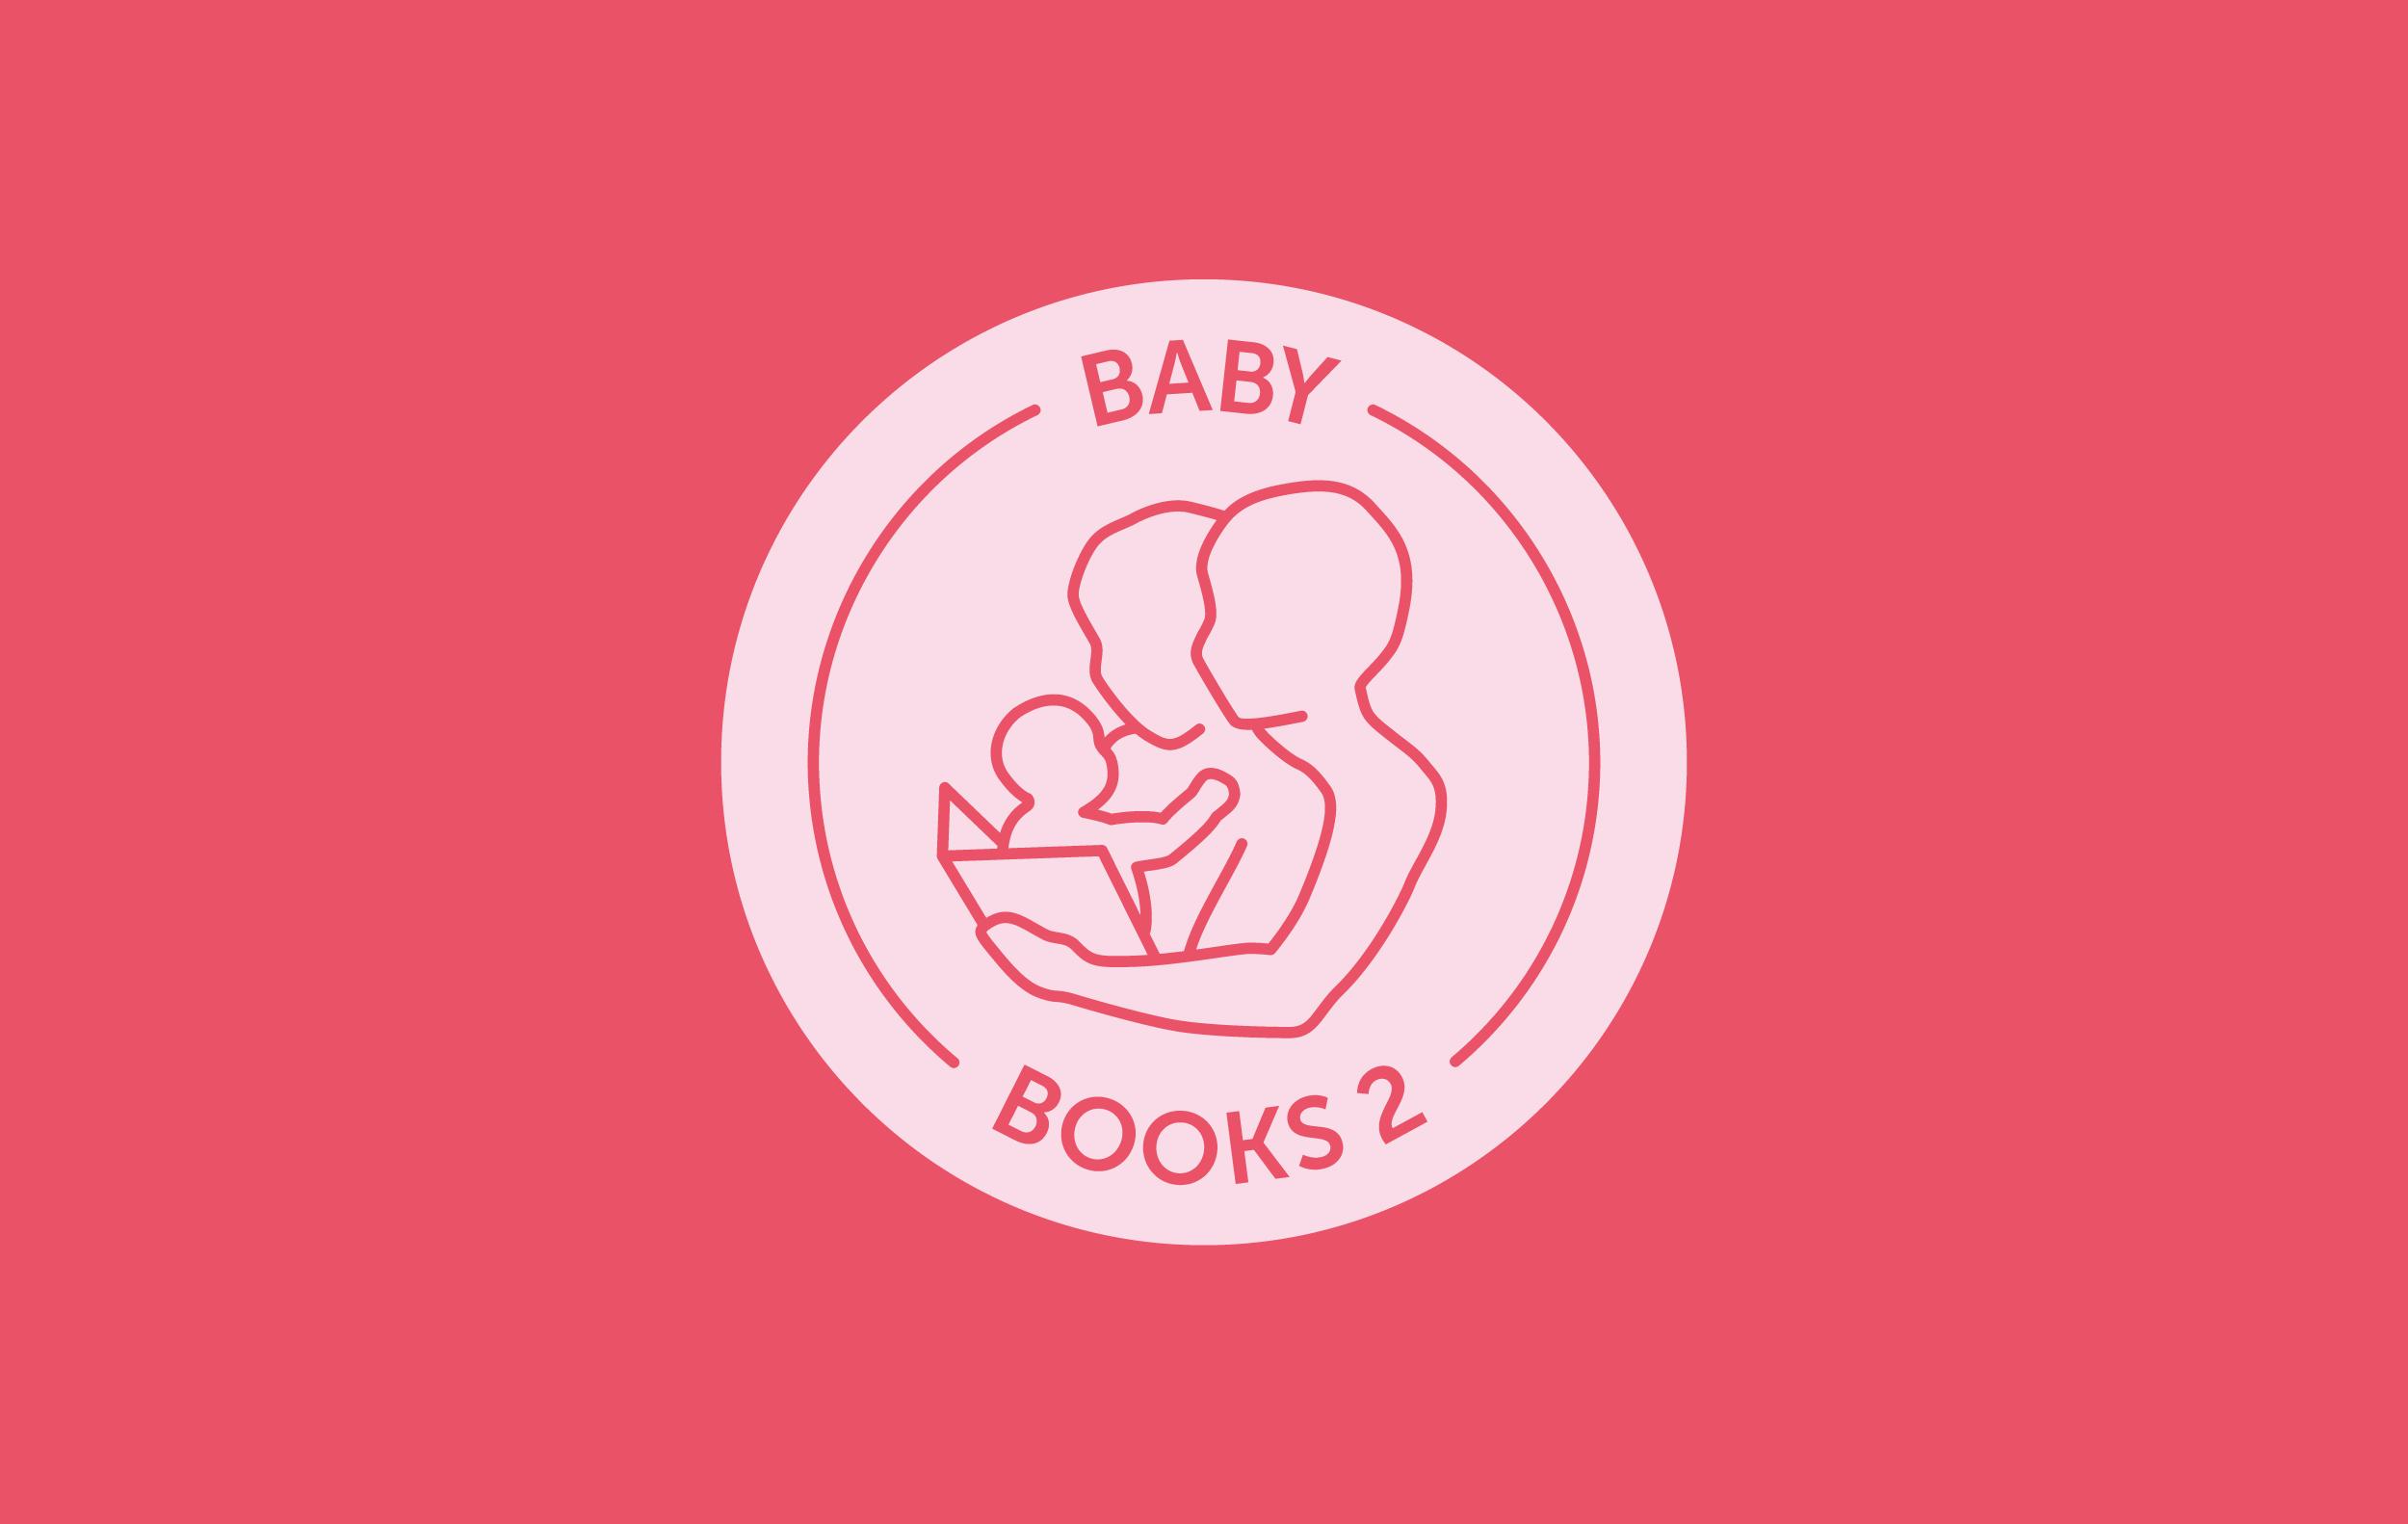 logos_babybooks2.jpg